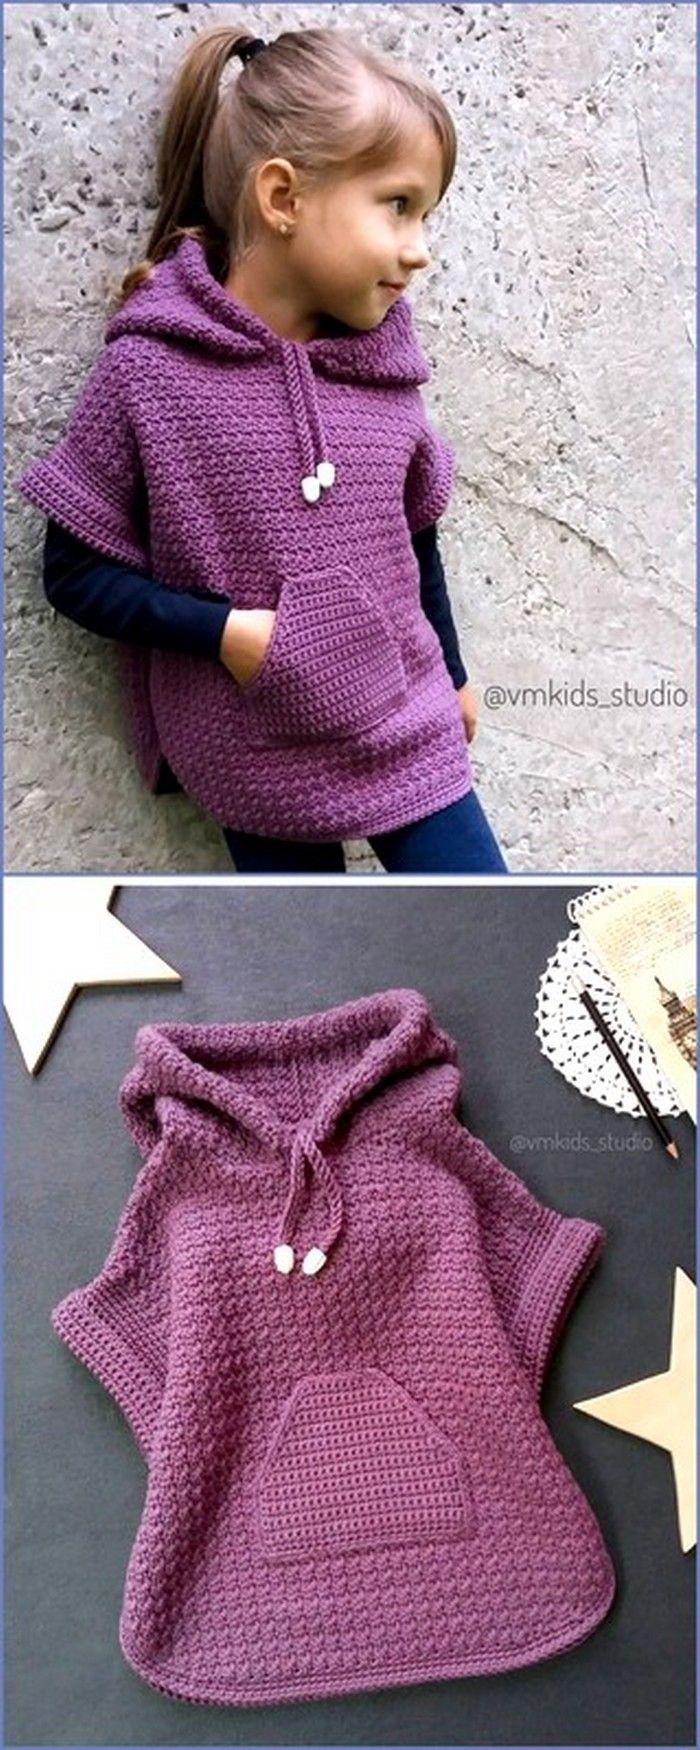 Diy Crochet Kids Clothing Design Pattern #babykidclothesandideas